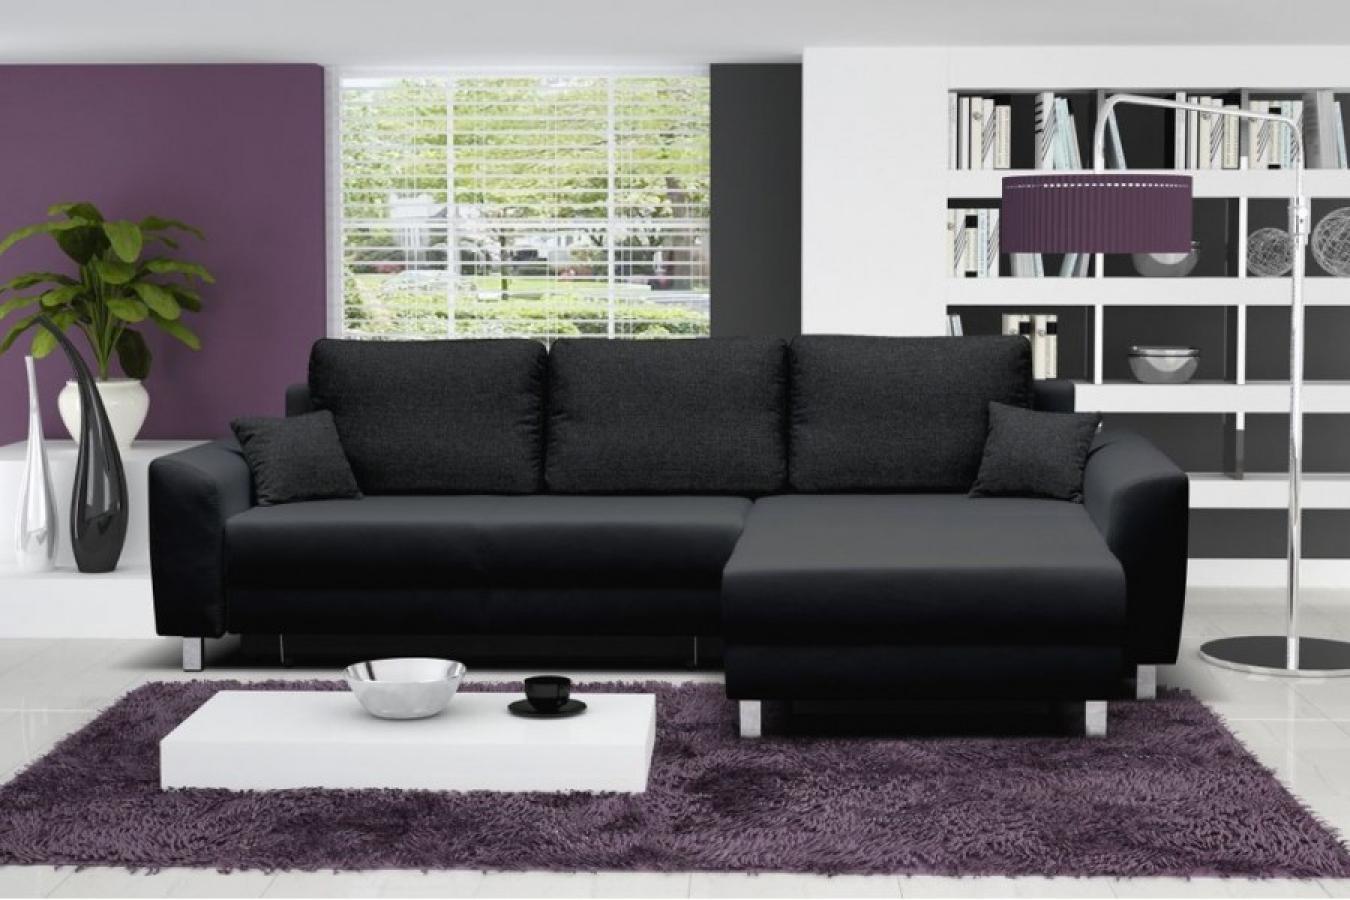 photos canap natuzzi havana. Black Bedroom Furniture Sets. Home Design Ideas